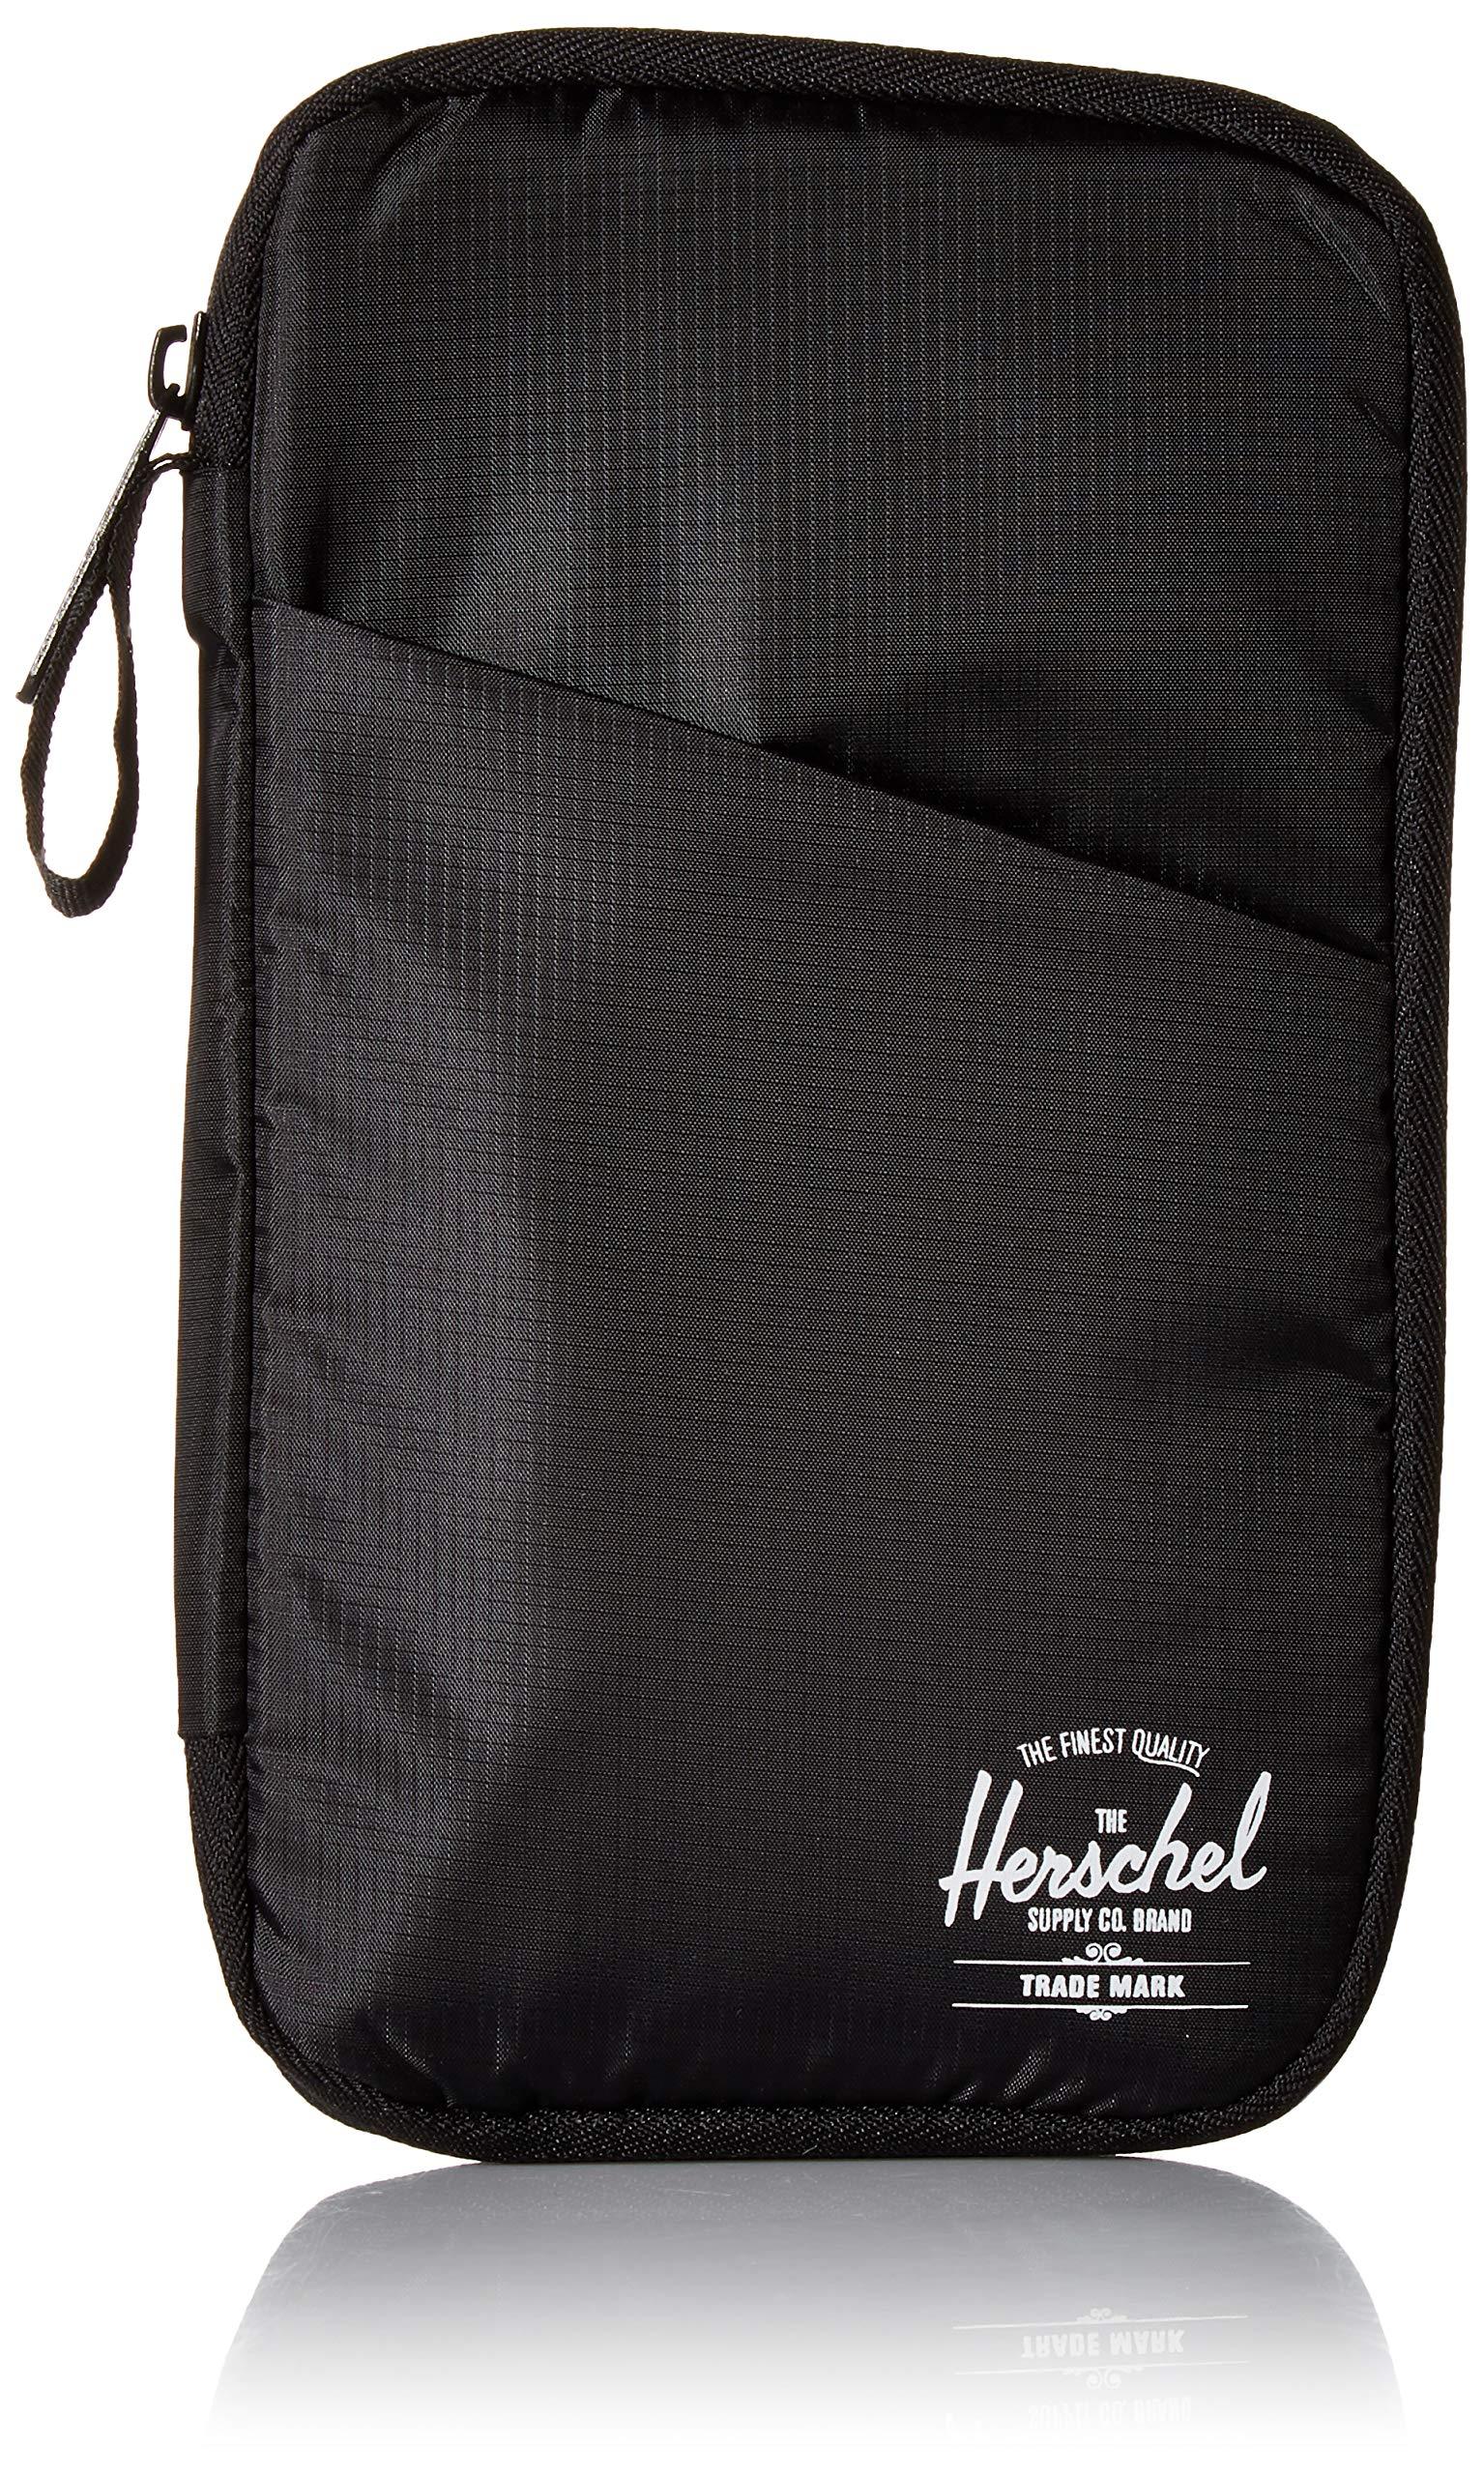 Herschel Travel Wallet, Black by Herschel